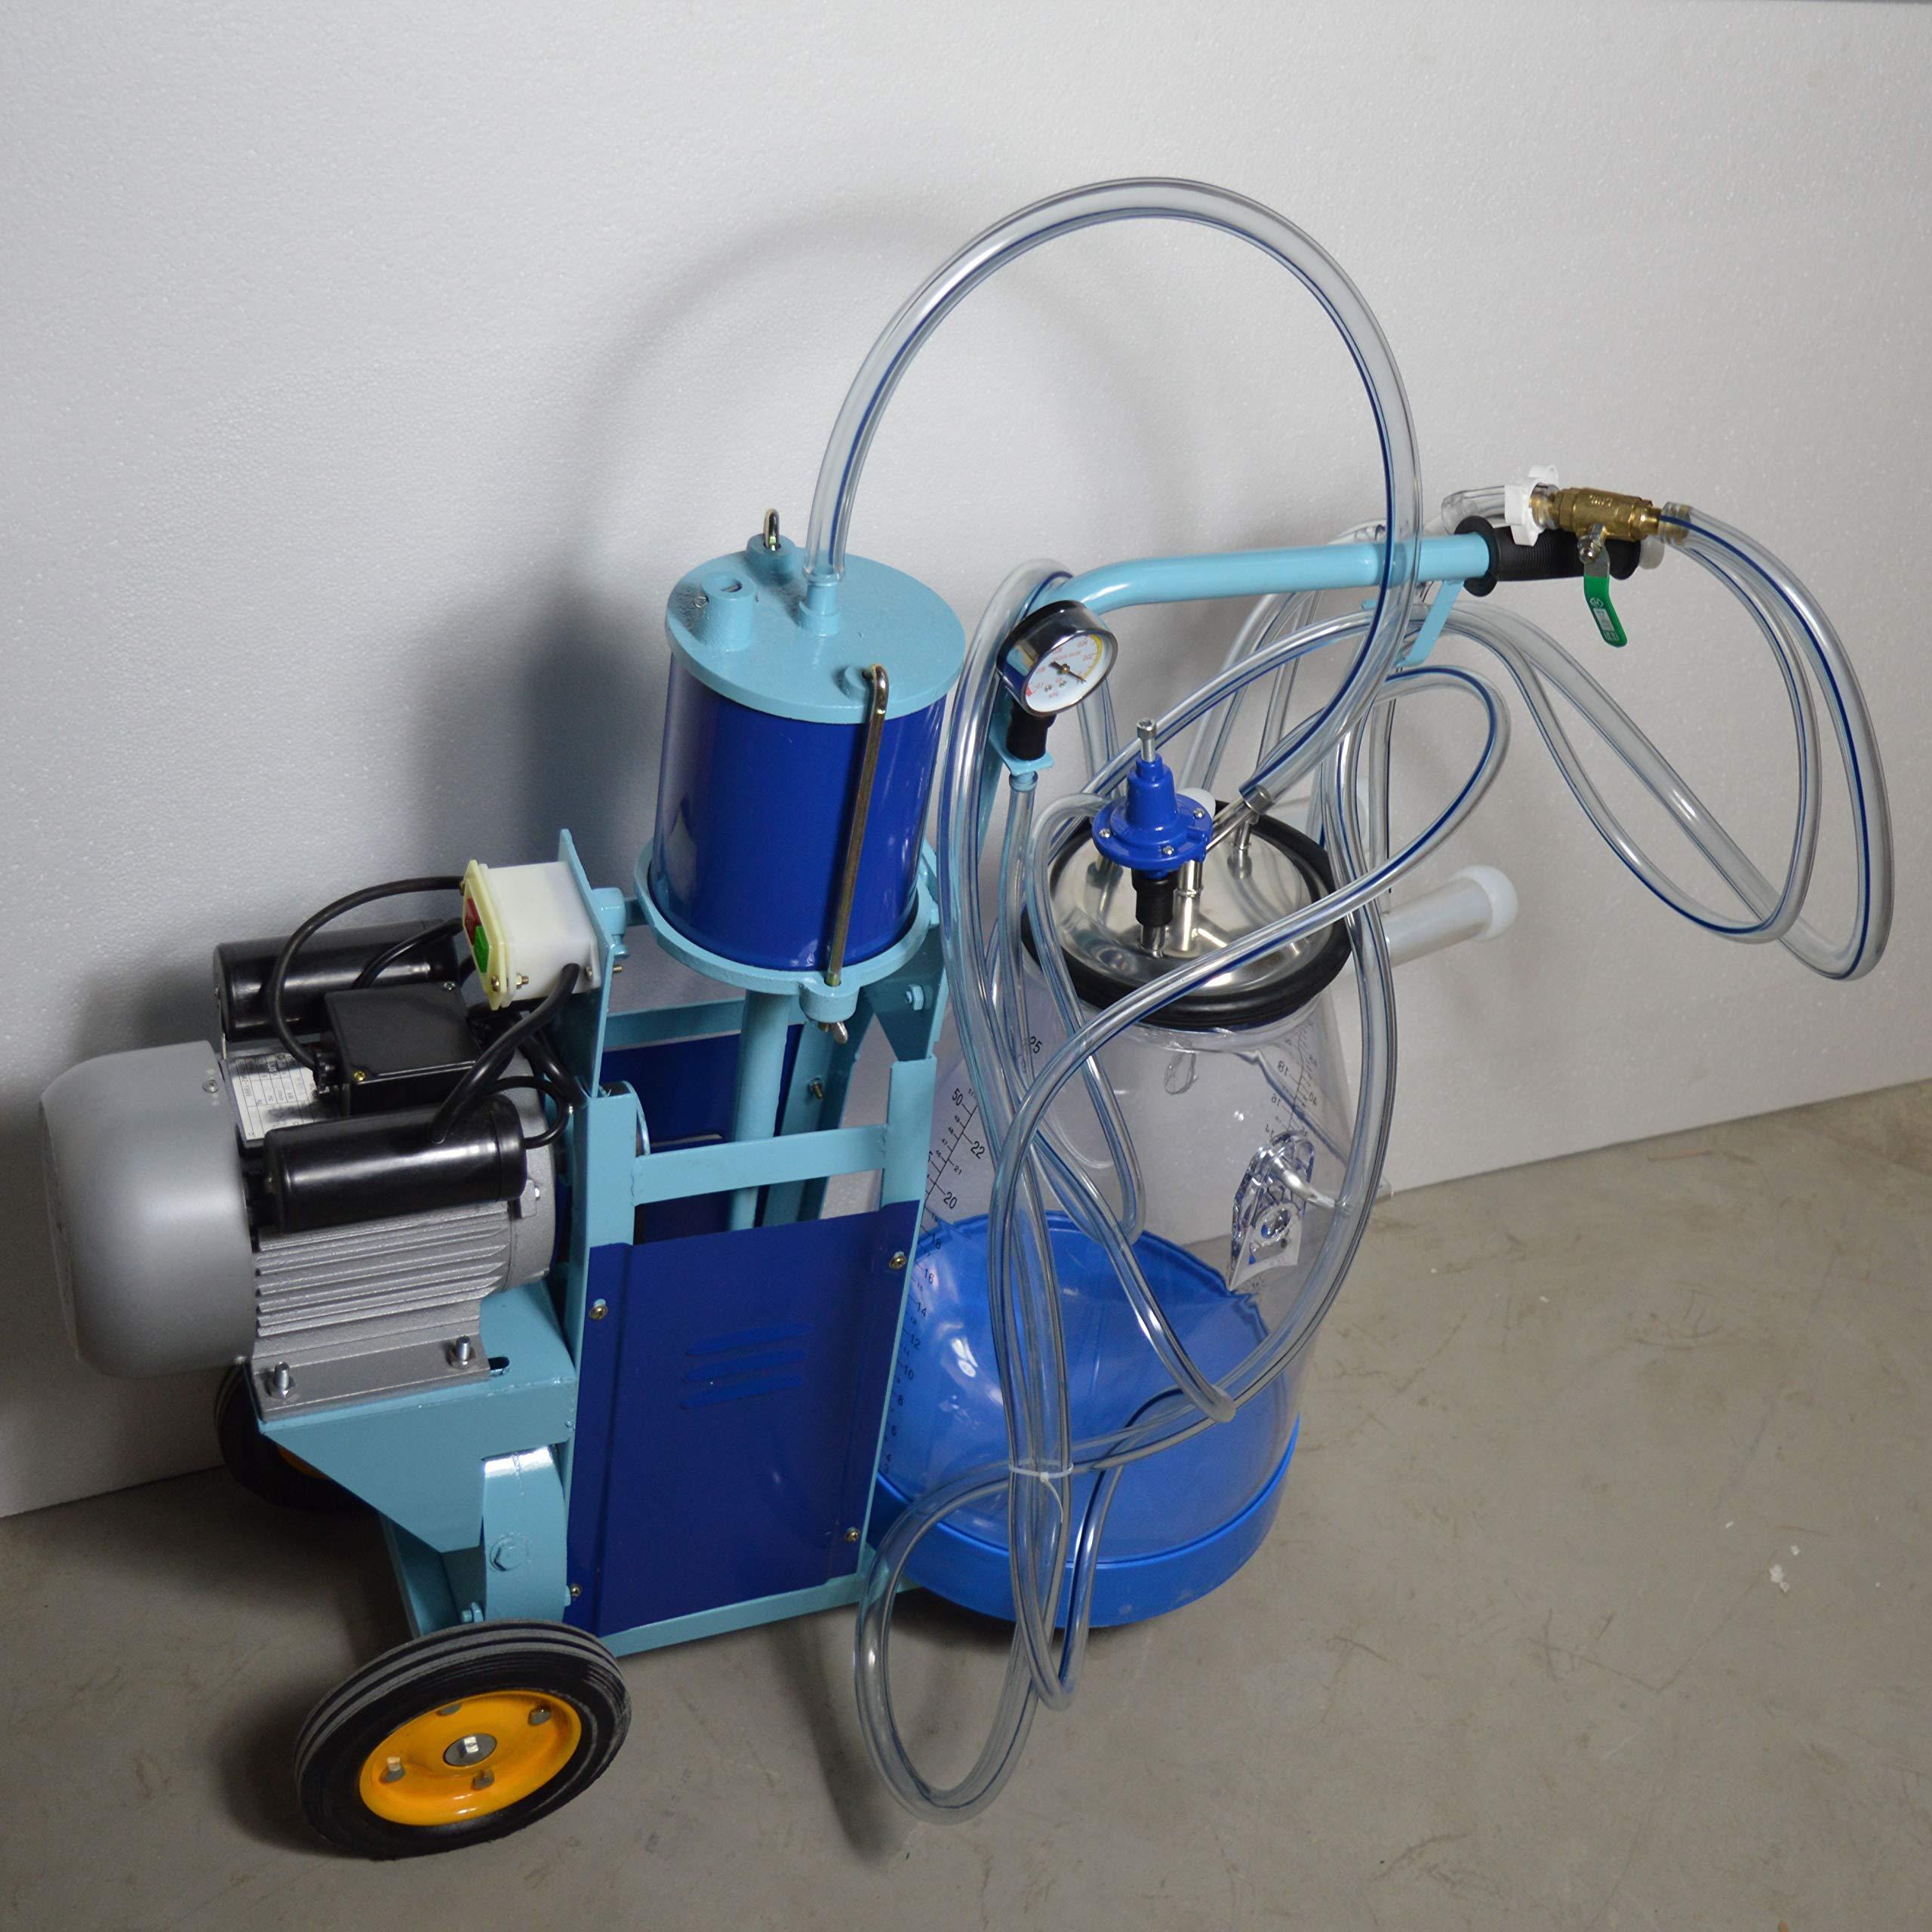 Techtongda Goat & Cow Milking Machine Milker Transparent Bucket #170685